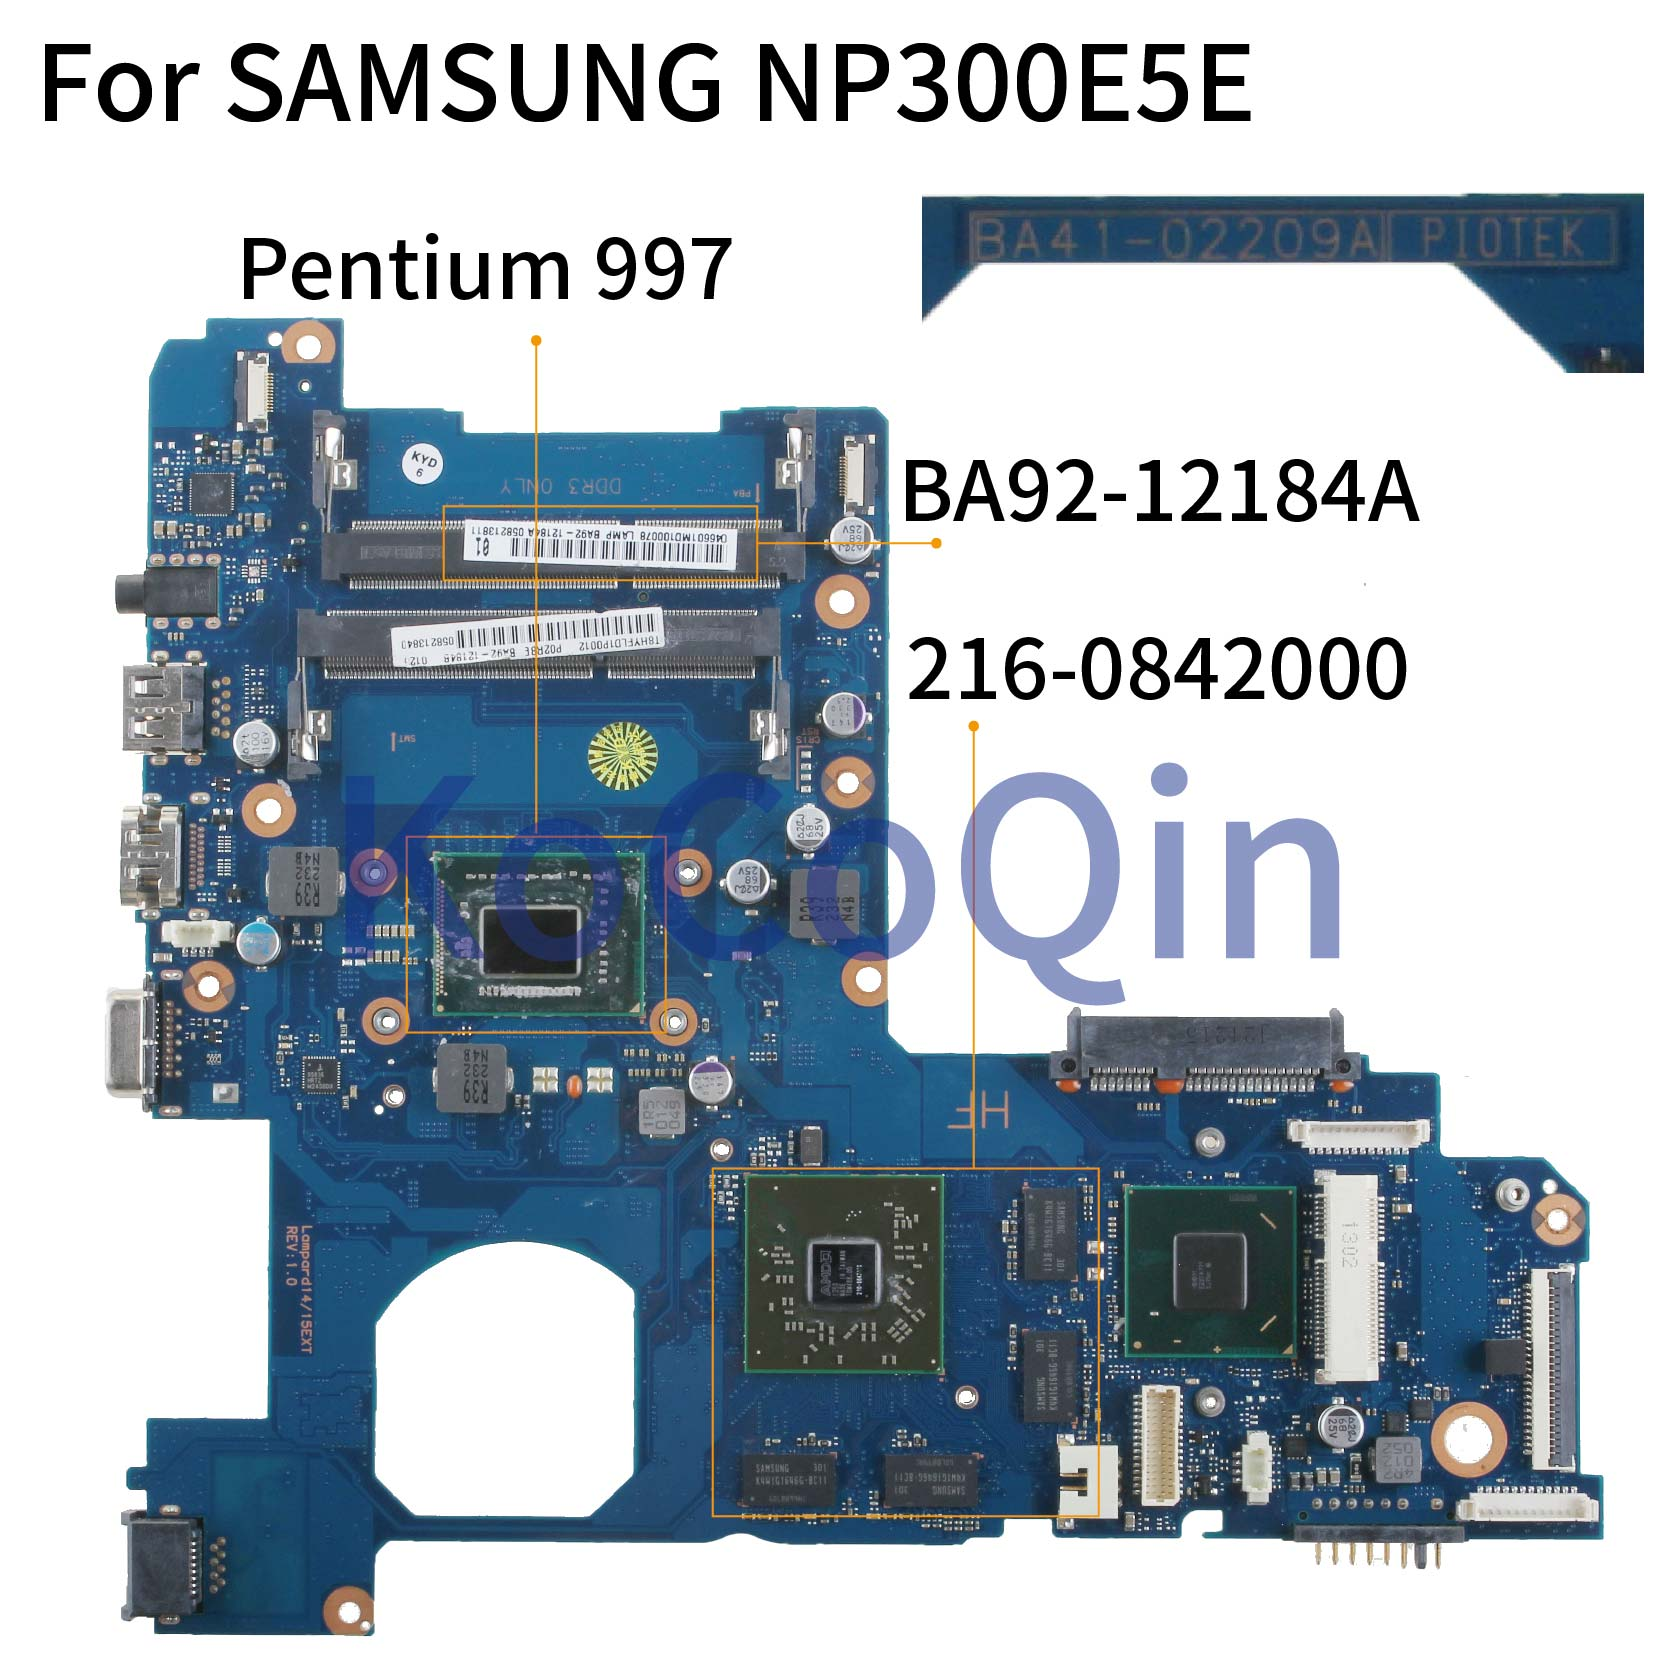 KoCoQin اللوحة الأم لأجهزة الكمبيوتر المحمول سامسونج NP300E5E BA41-02209A BA92-12184A بنتيوم 997 216-0842000 SJTNV